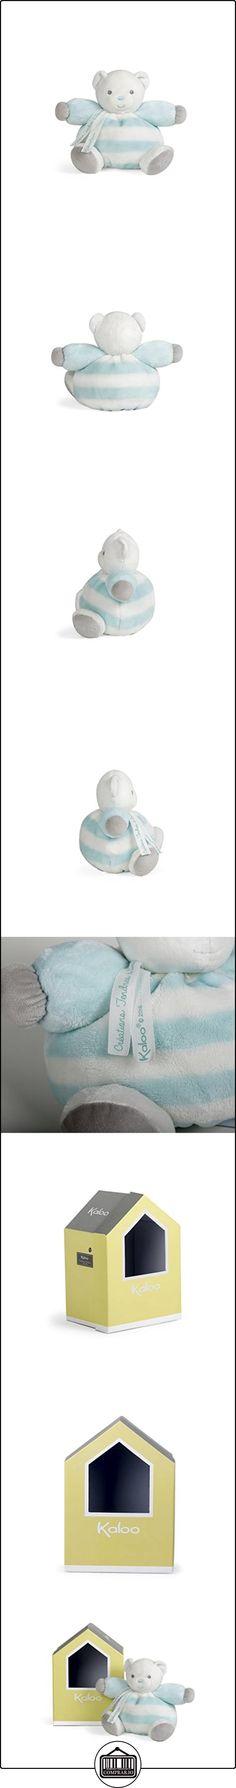 Kaloo bebé PASTEL de oso de peluche Aqua/crema 20cm  ✿ Regalos para recién nacidos - Bebes ✿ ▬► Ver oferta: http://comprar.io/goto/B01MYBJQQO